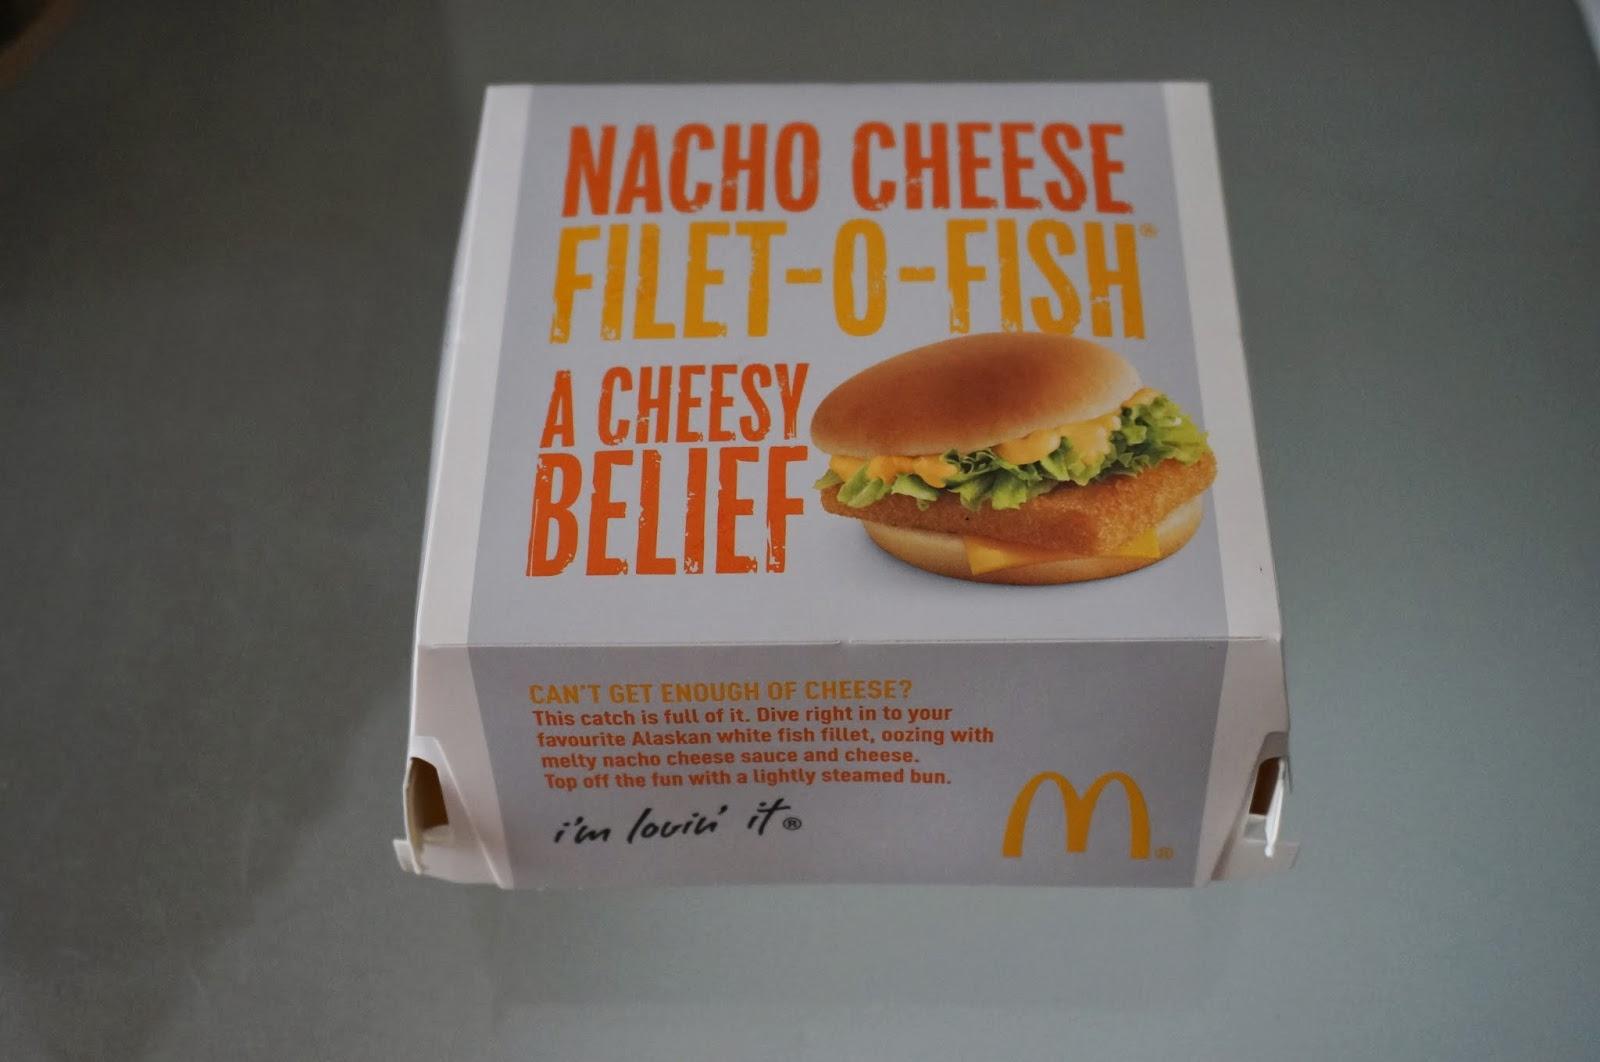 Mcdonald 39 s around the world nacho cheese filet o fish for Mcdonald s filet o fish price